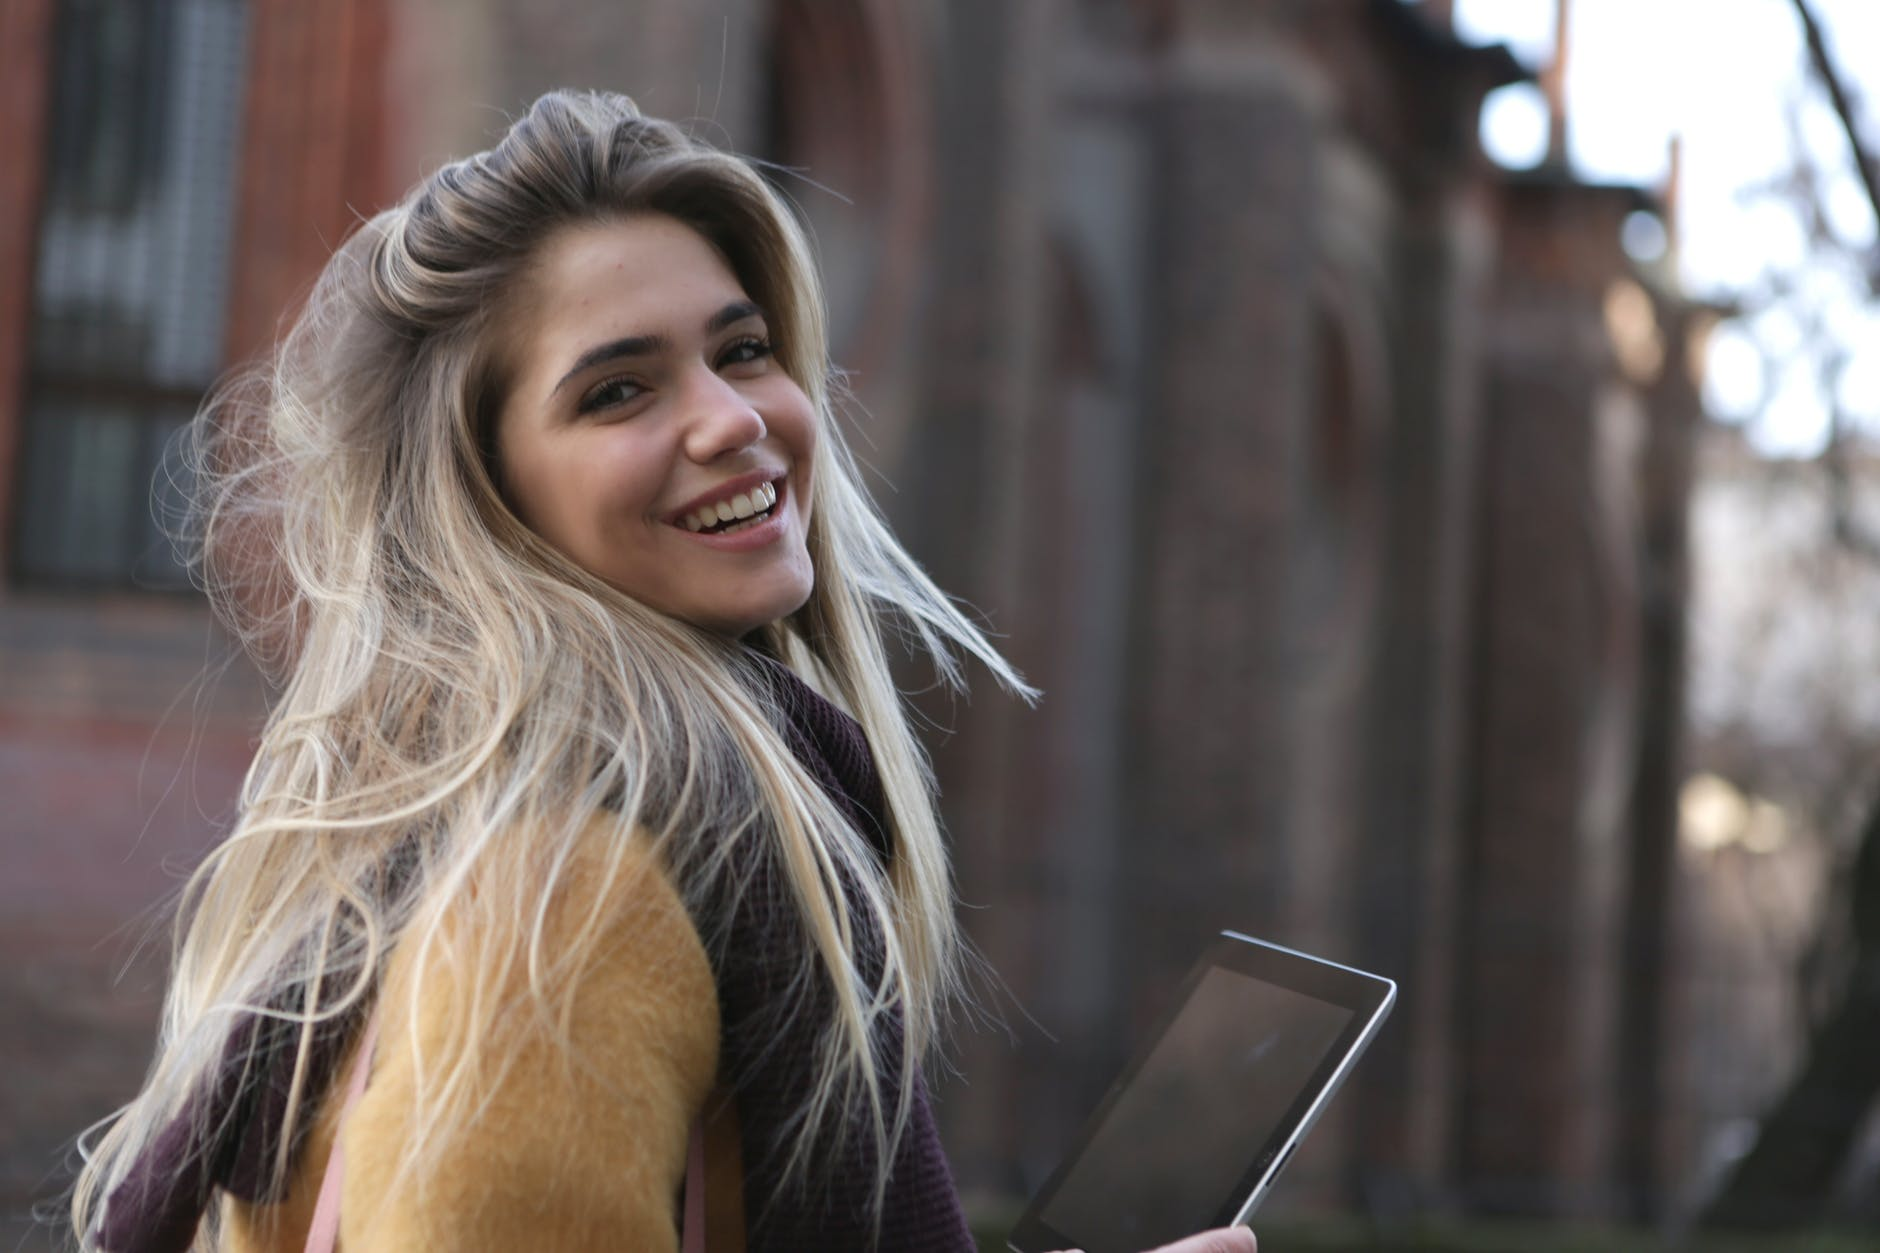 woman holding a ipad